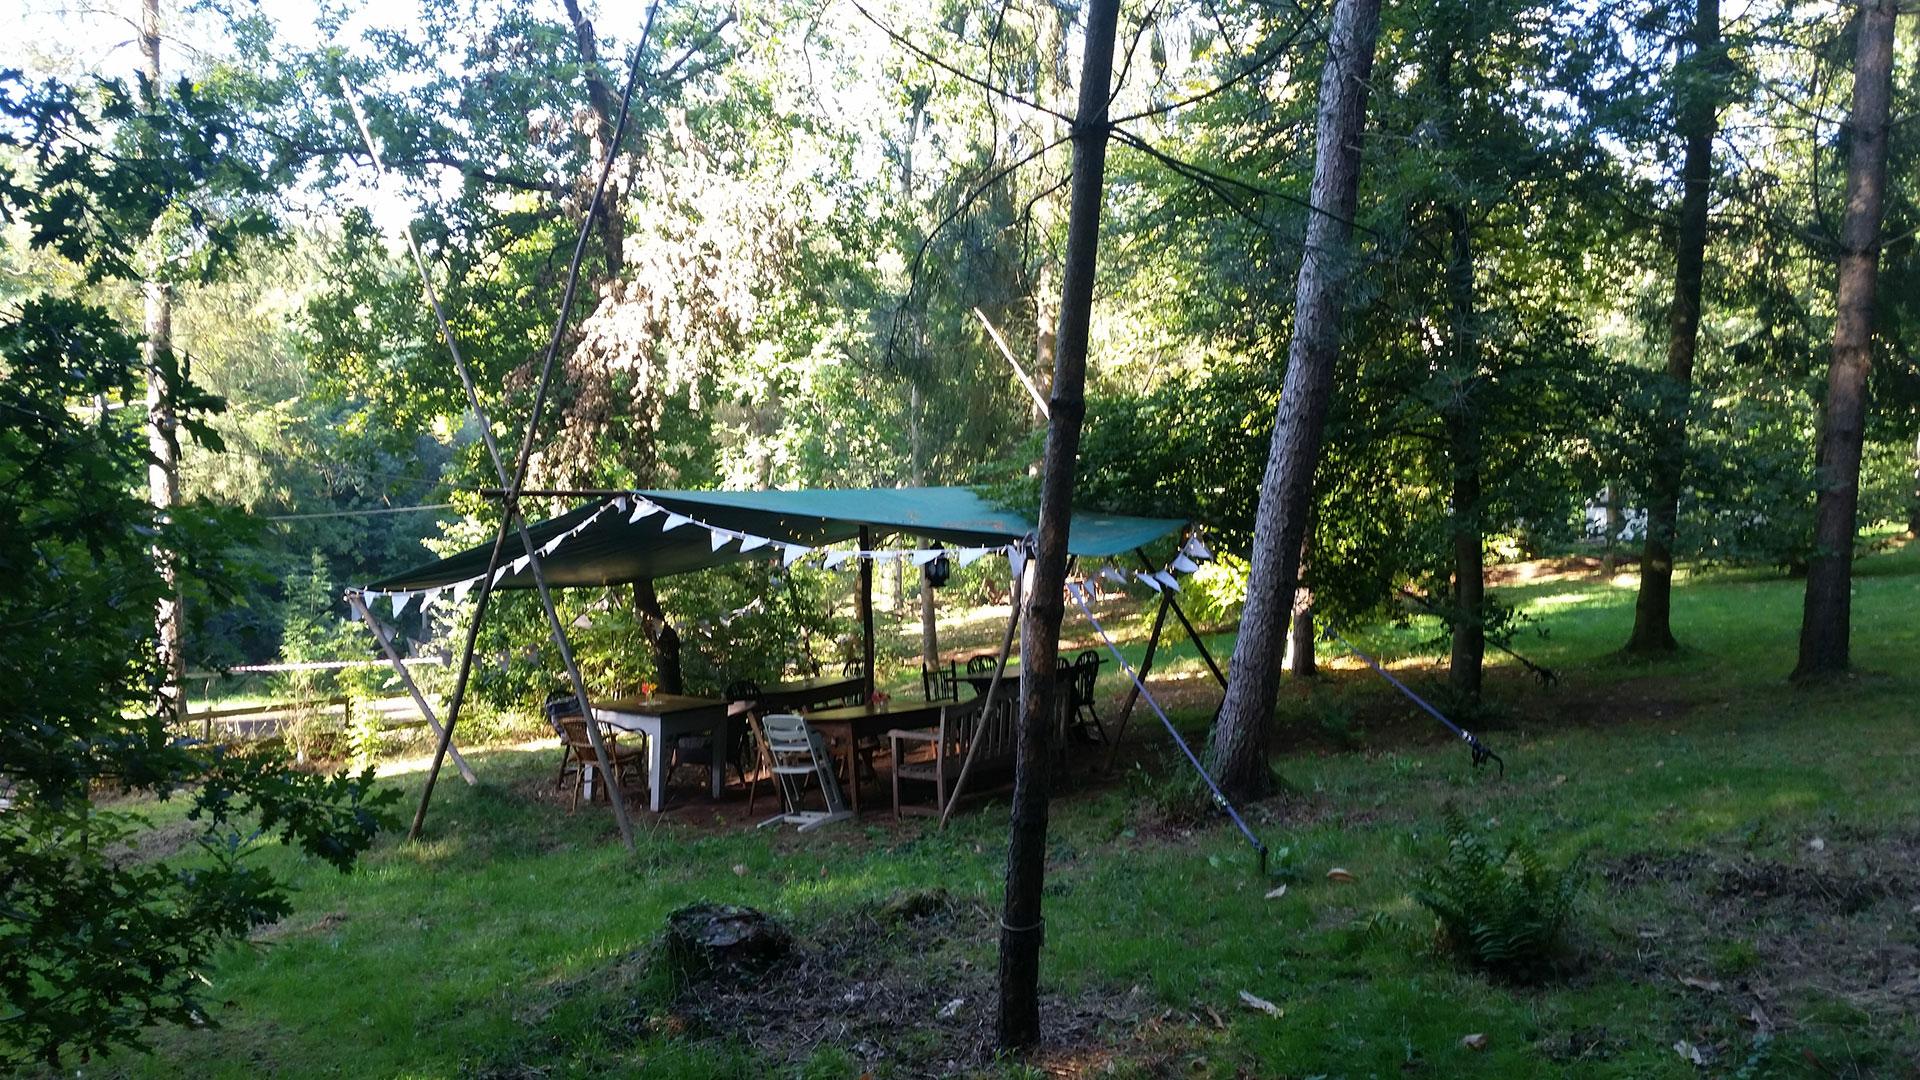 Woodsman's awning